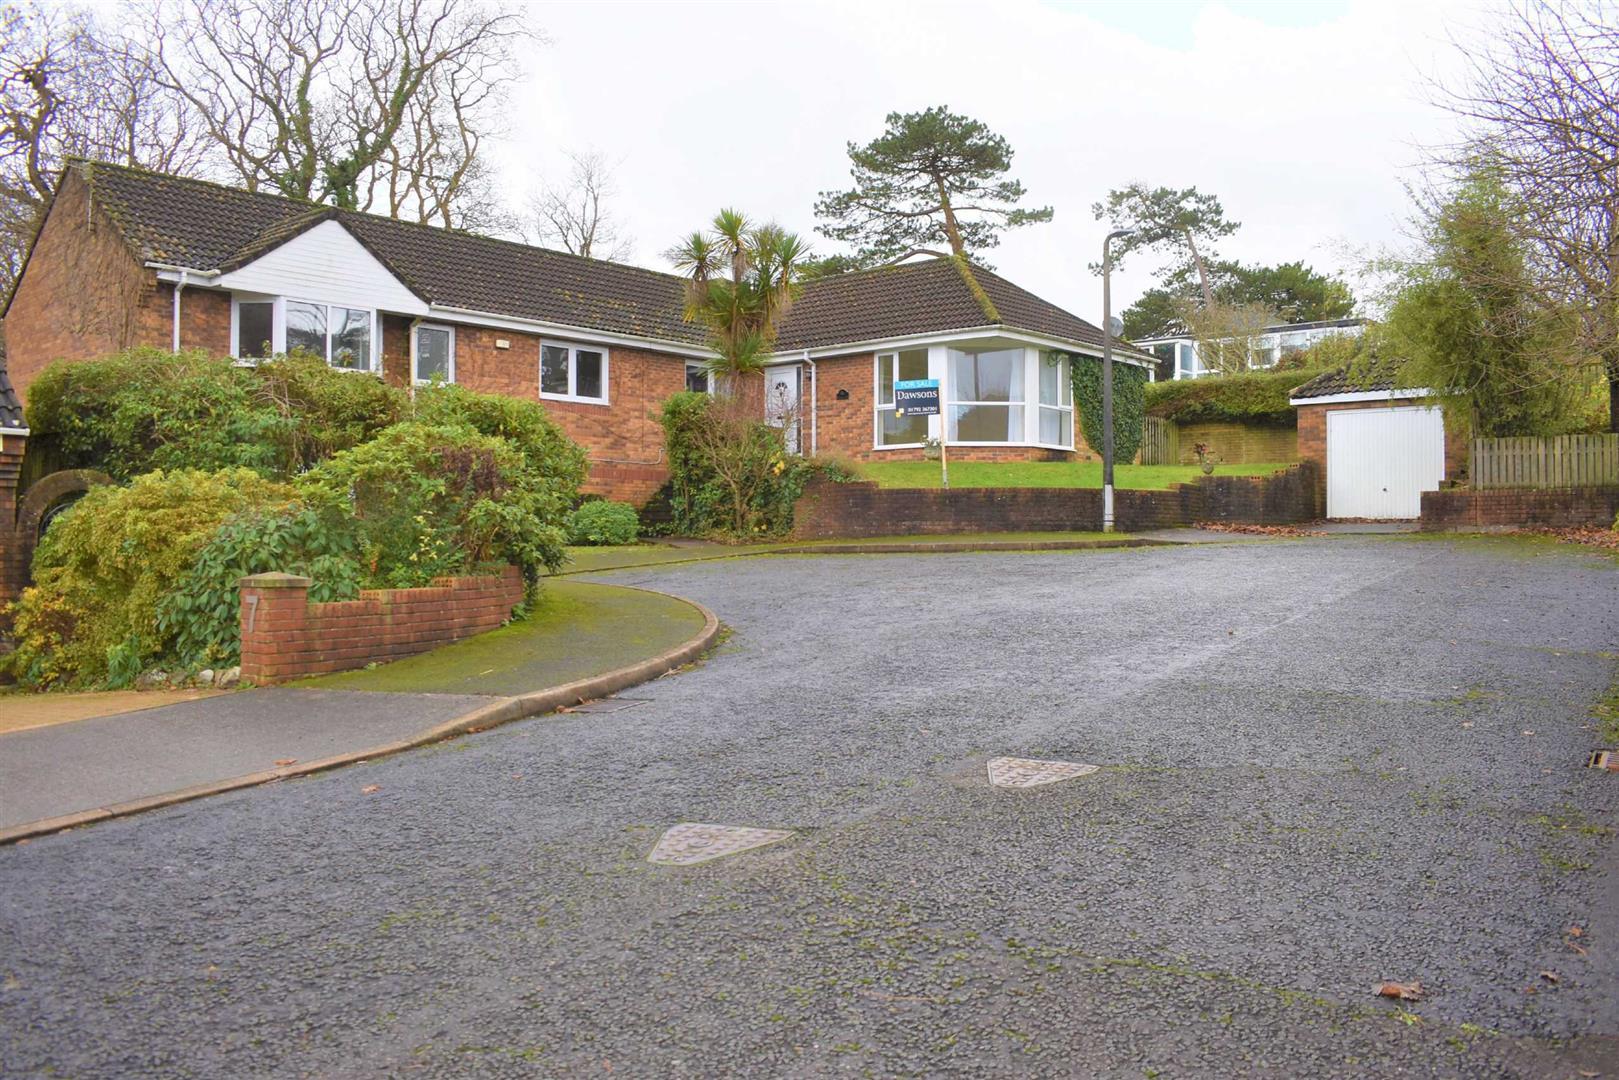 Whitegates, Mayals, Swansea, SA3 5HW